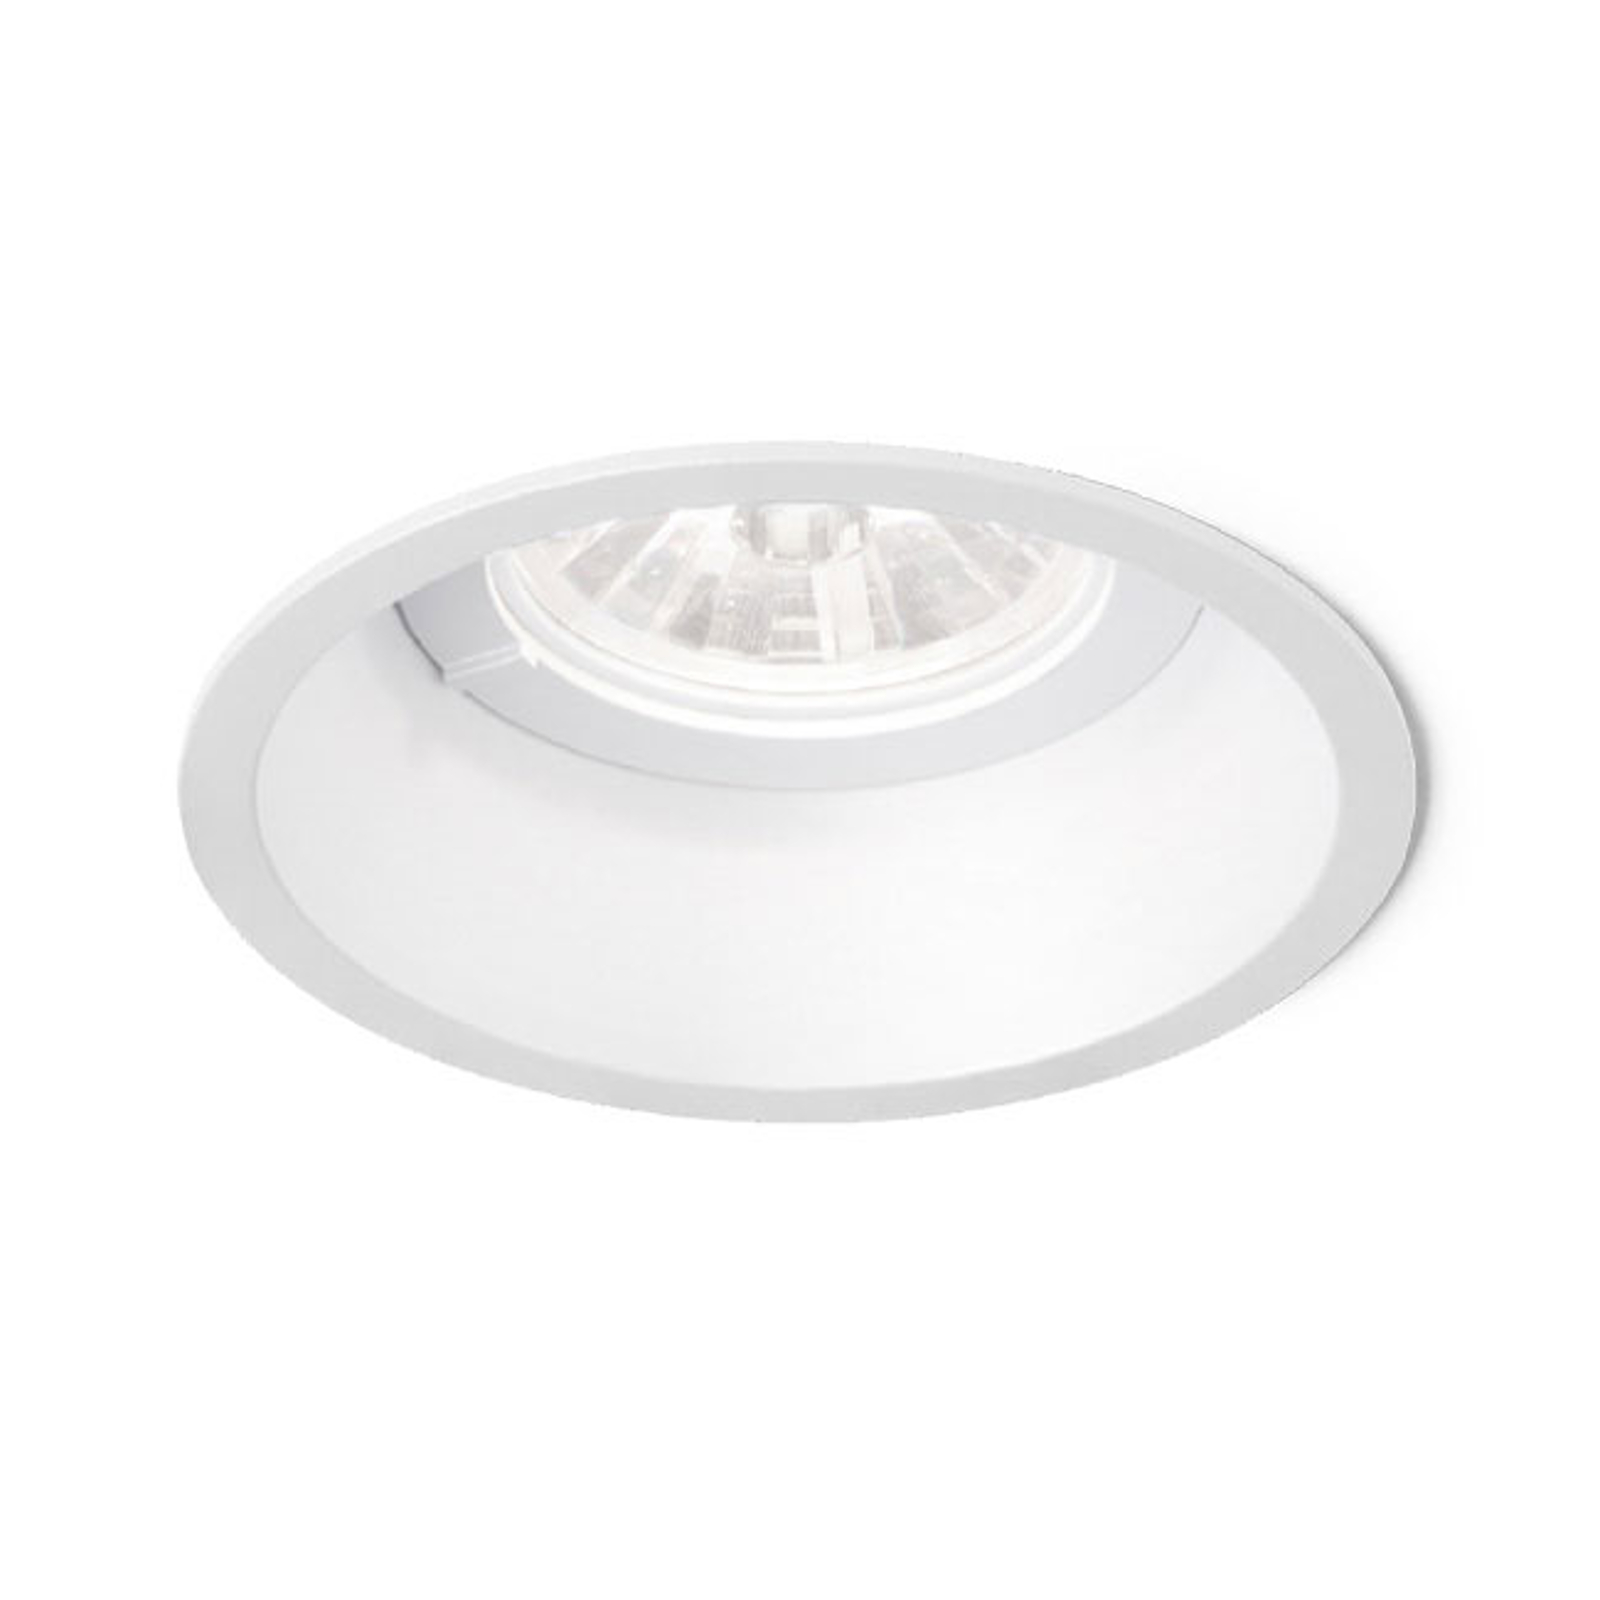 WEVER & DUCRÉ Deep 1.0 LED dim-to-warm weiß